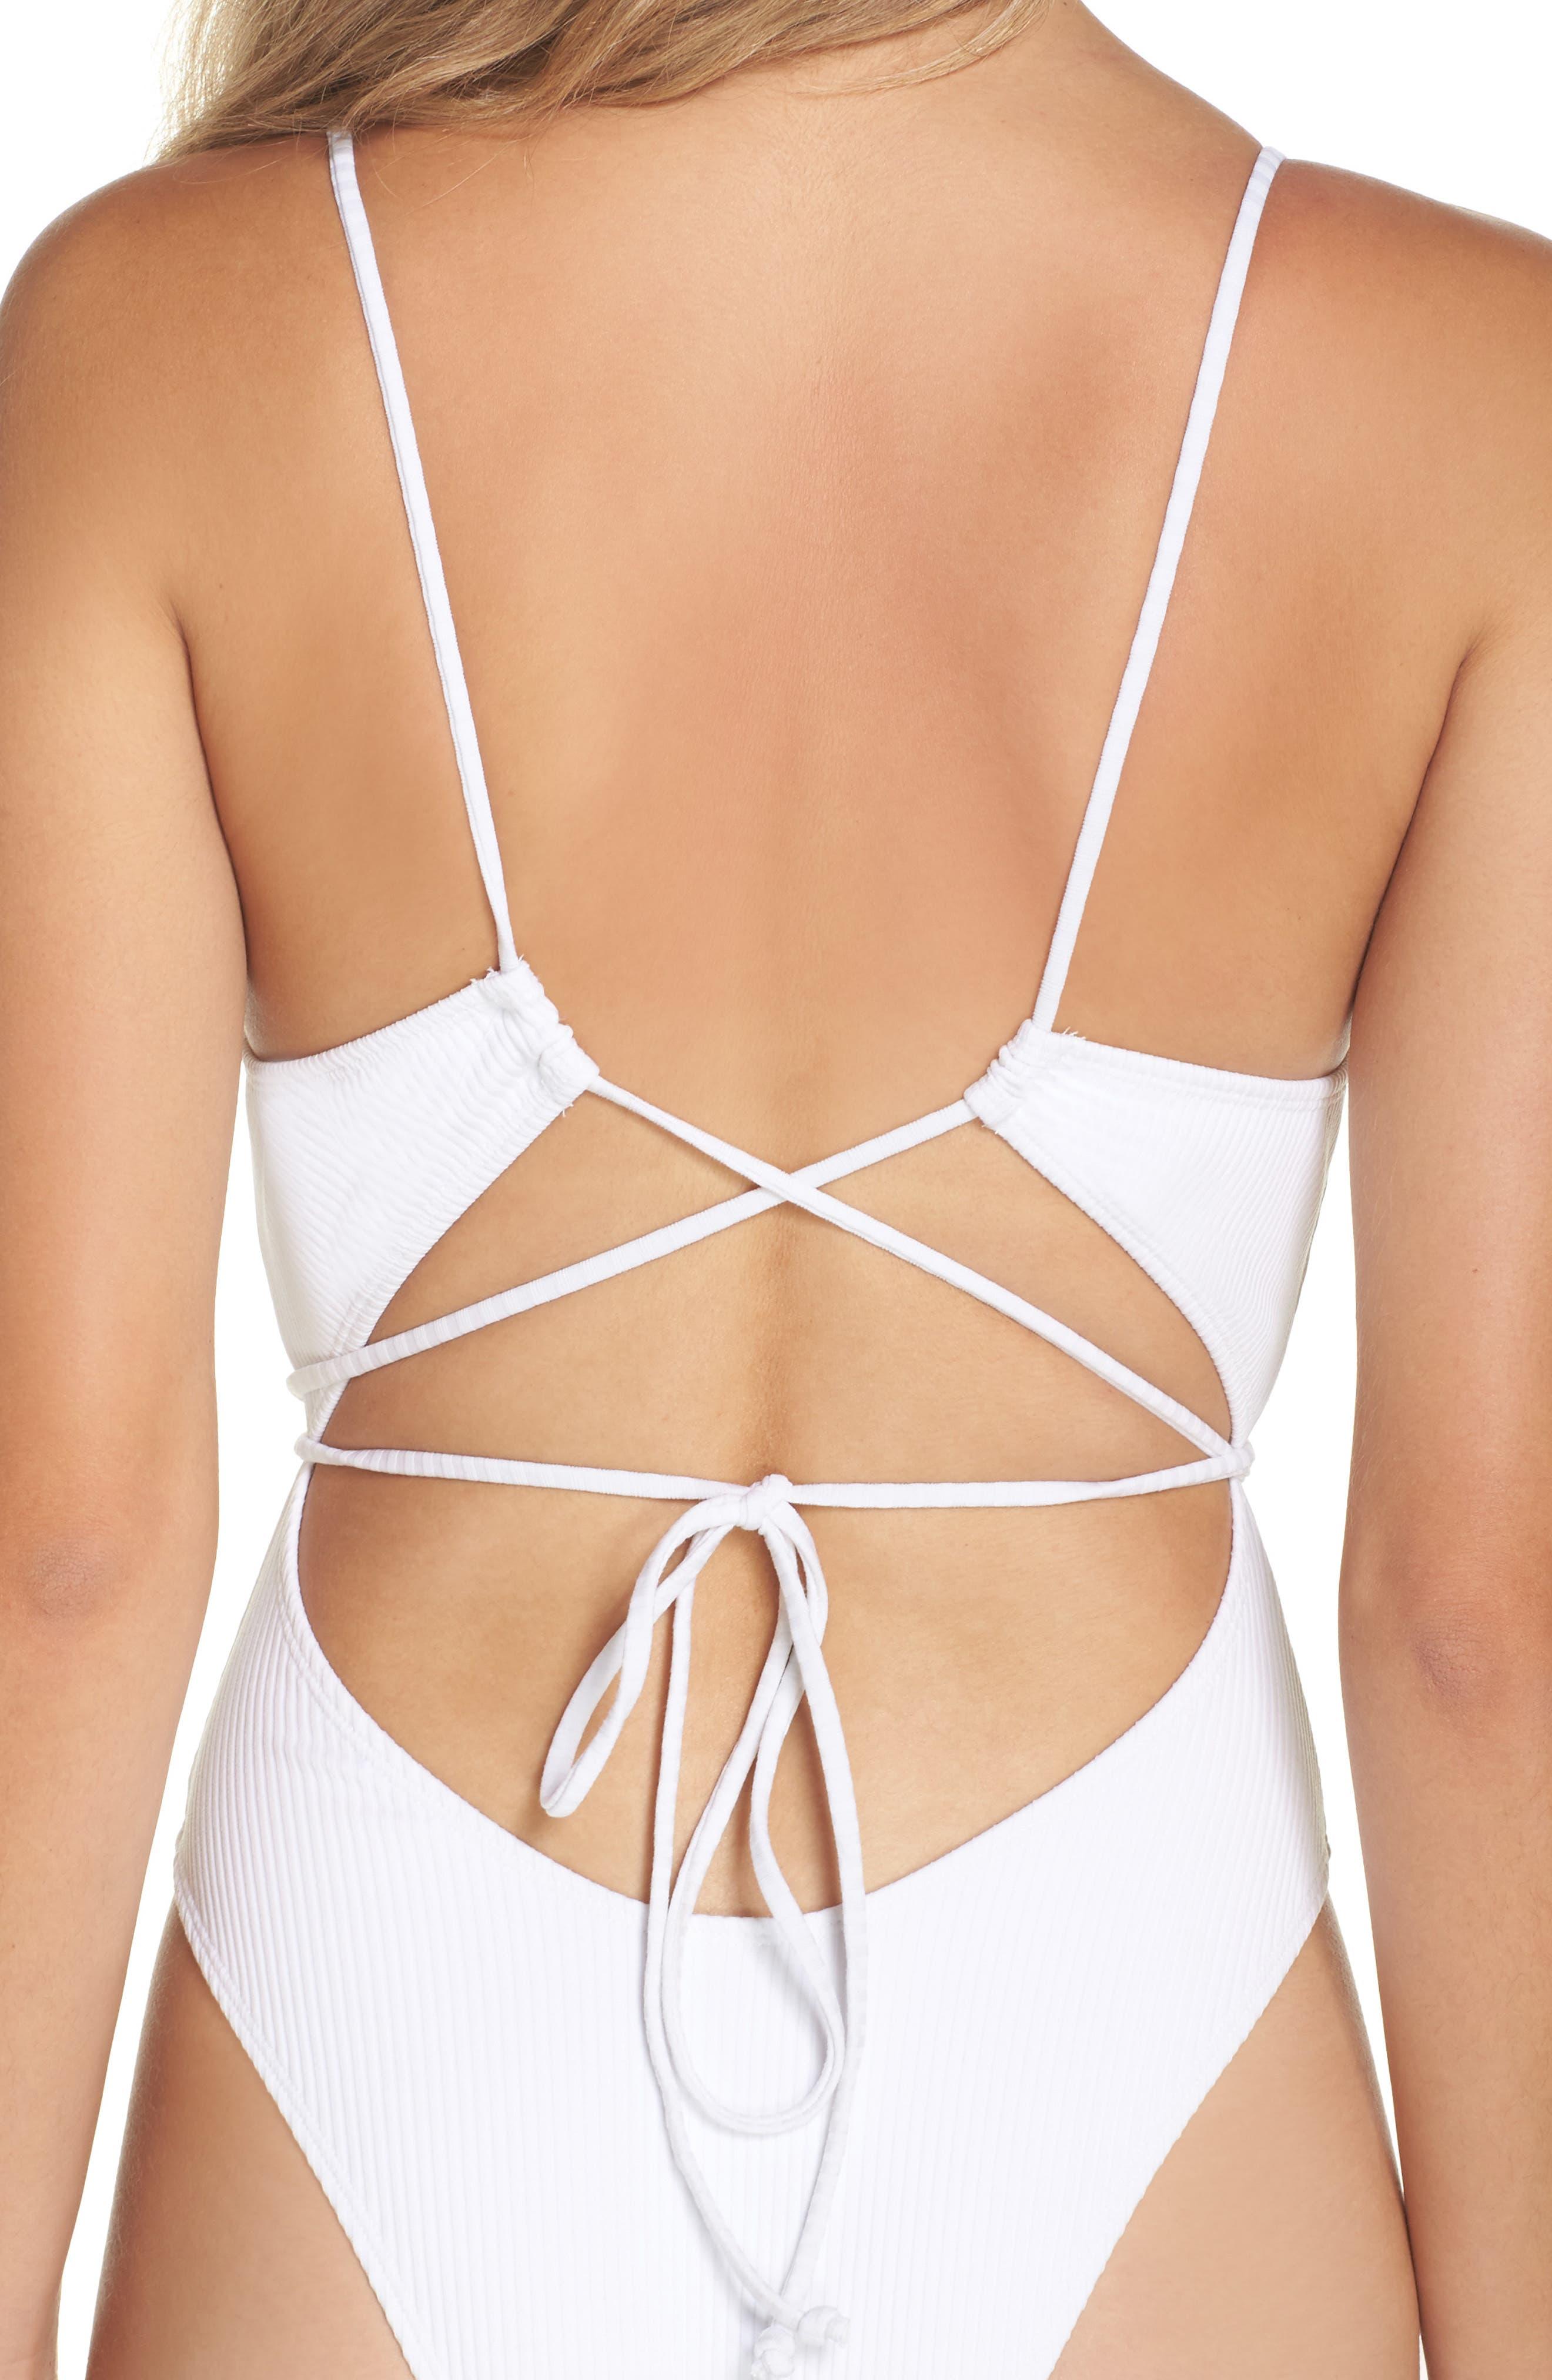 Daiquiri One-Piece Swimsuit,                             Alternate thumbnail 4, color,                             Sea Salt